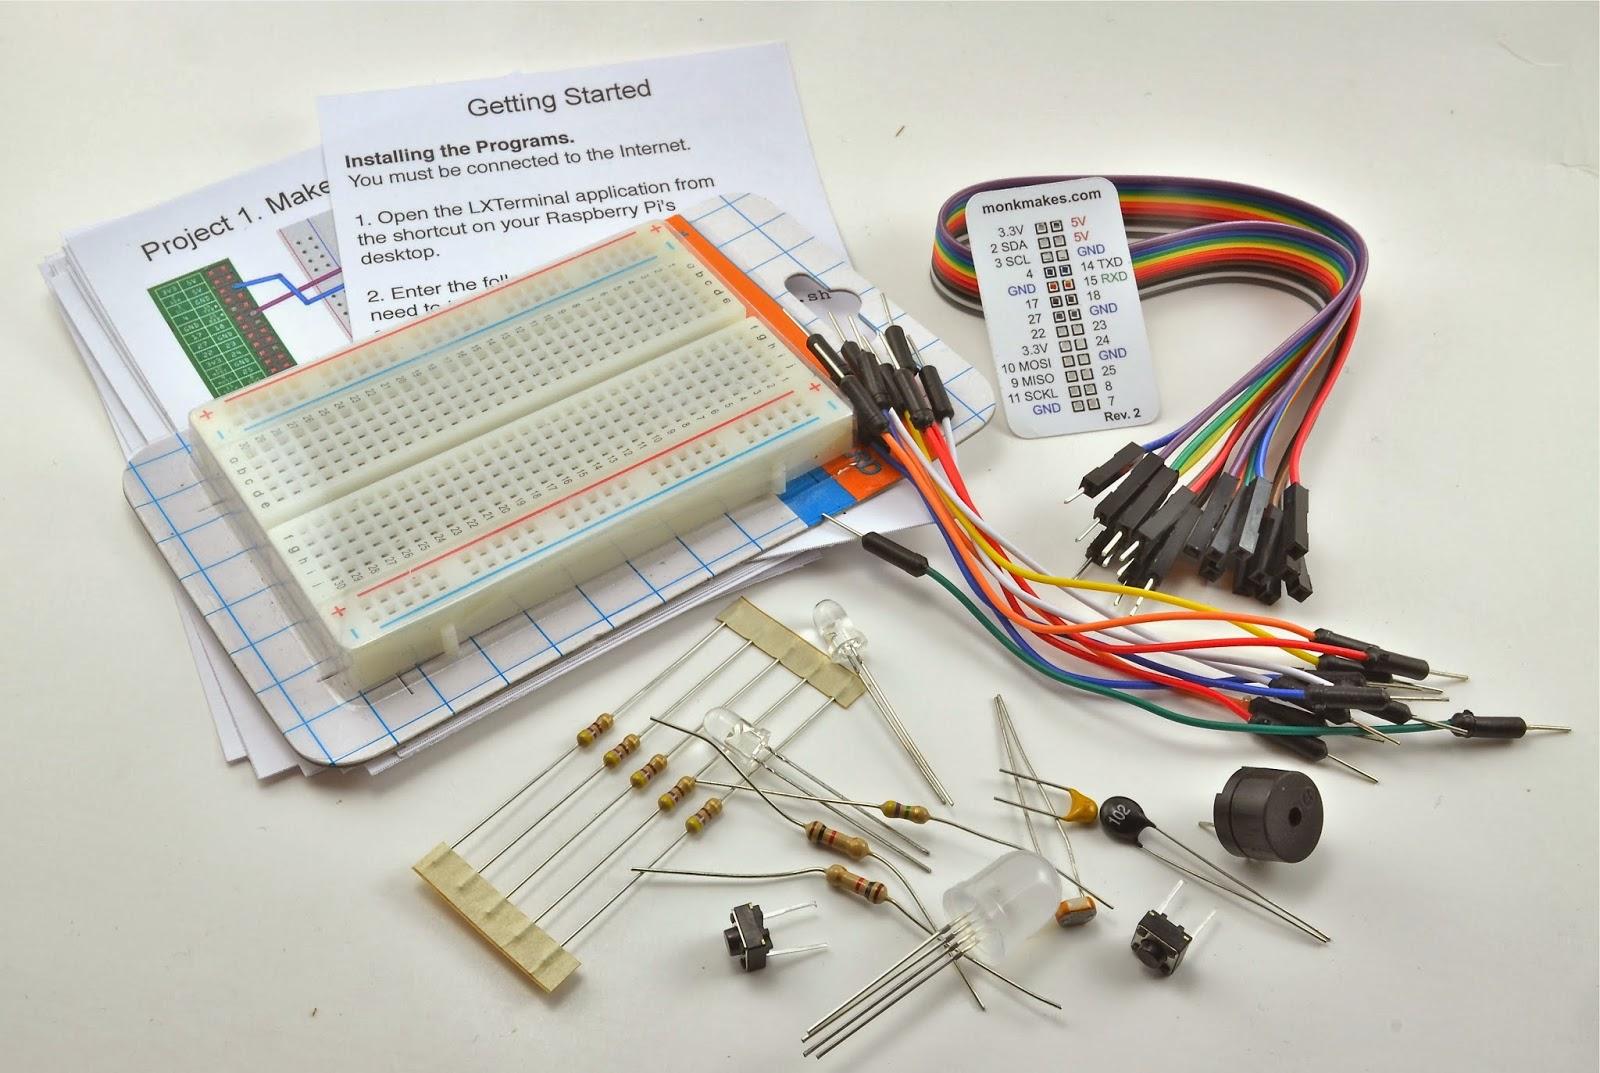 Dr  Monk's DIY Electronics Blog: Raspberry Pi Fridge Minder